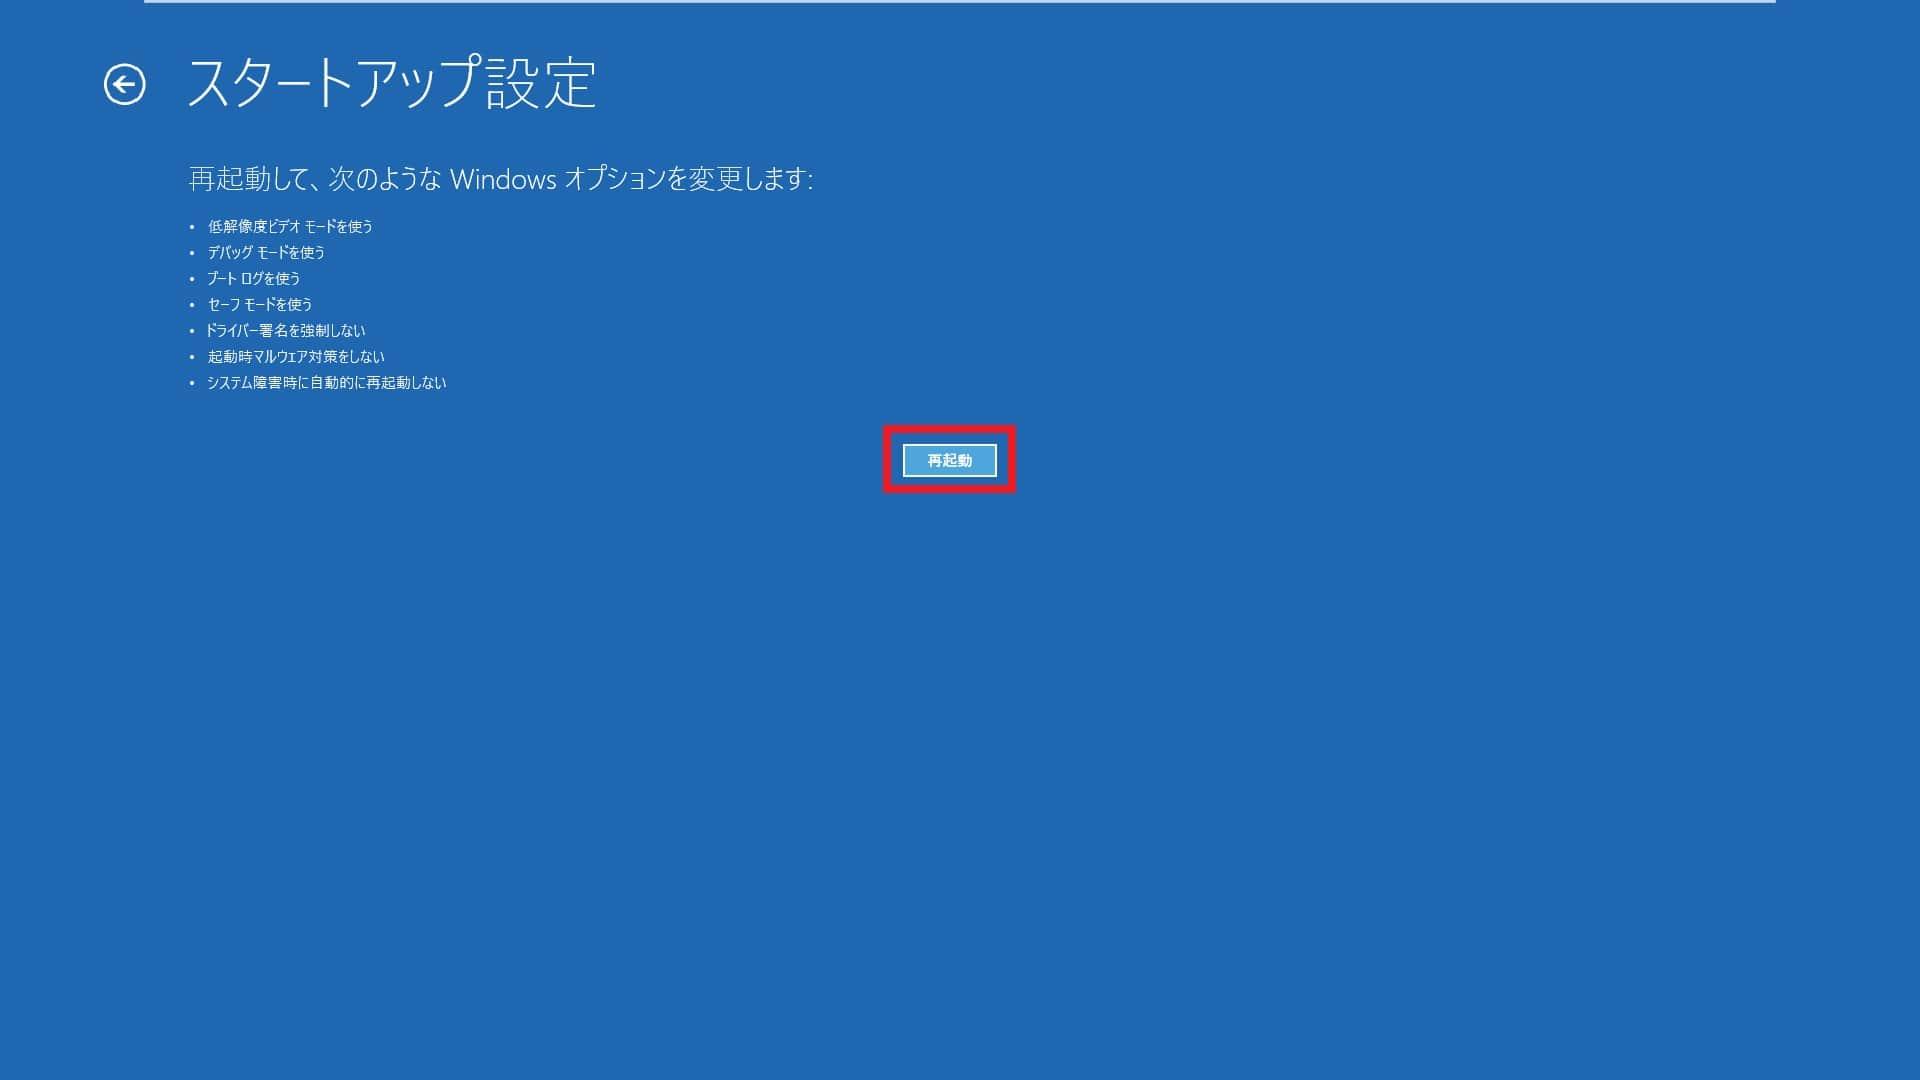 http://art33.photozou.jp/pub/119/2912119/photo/237849755_org.v1466278853.jpg